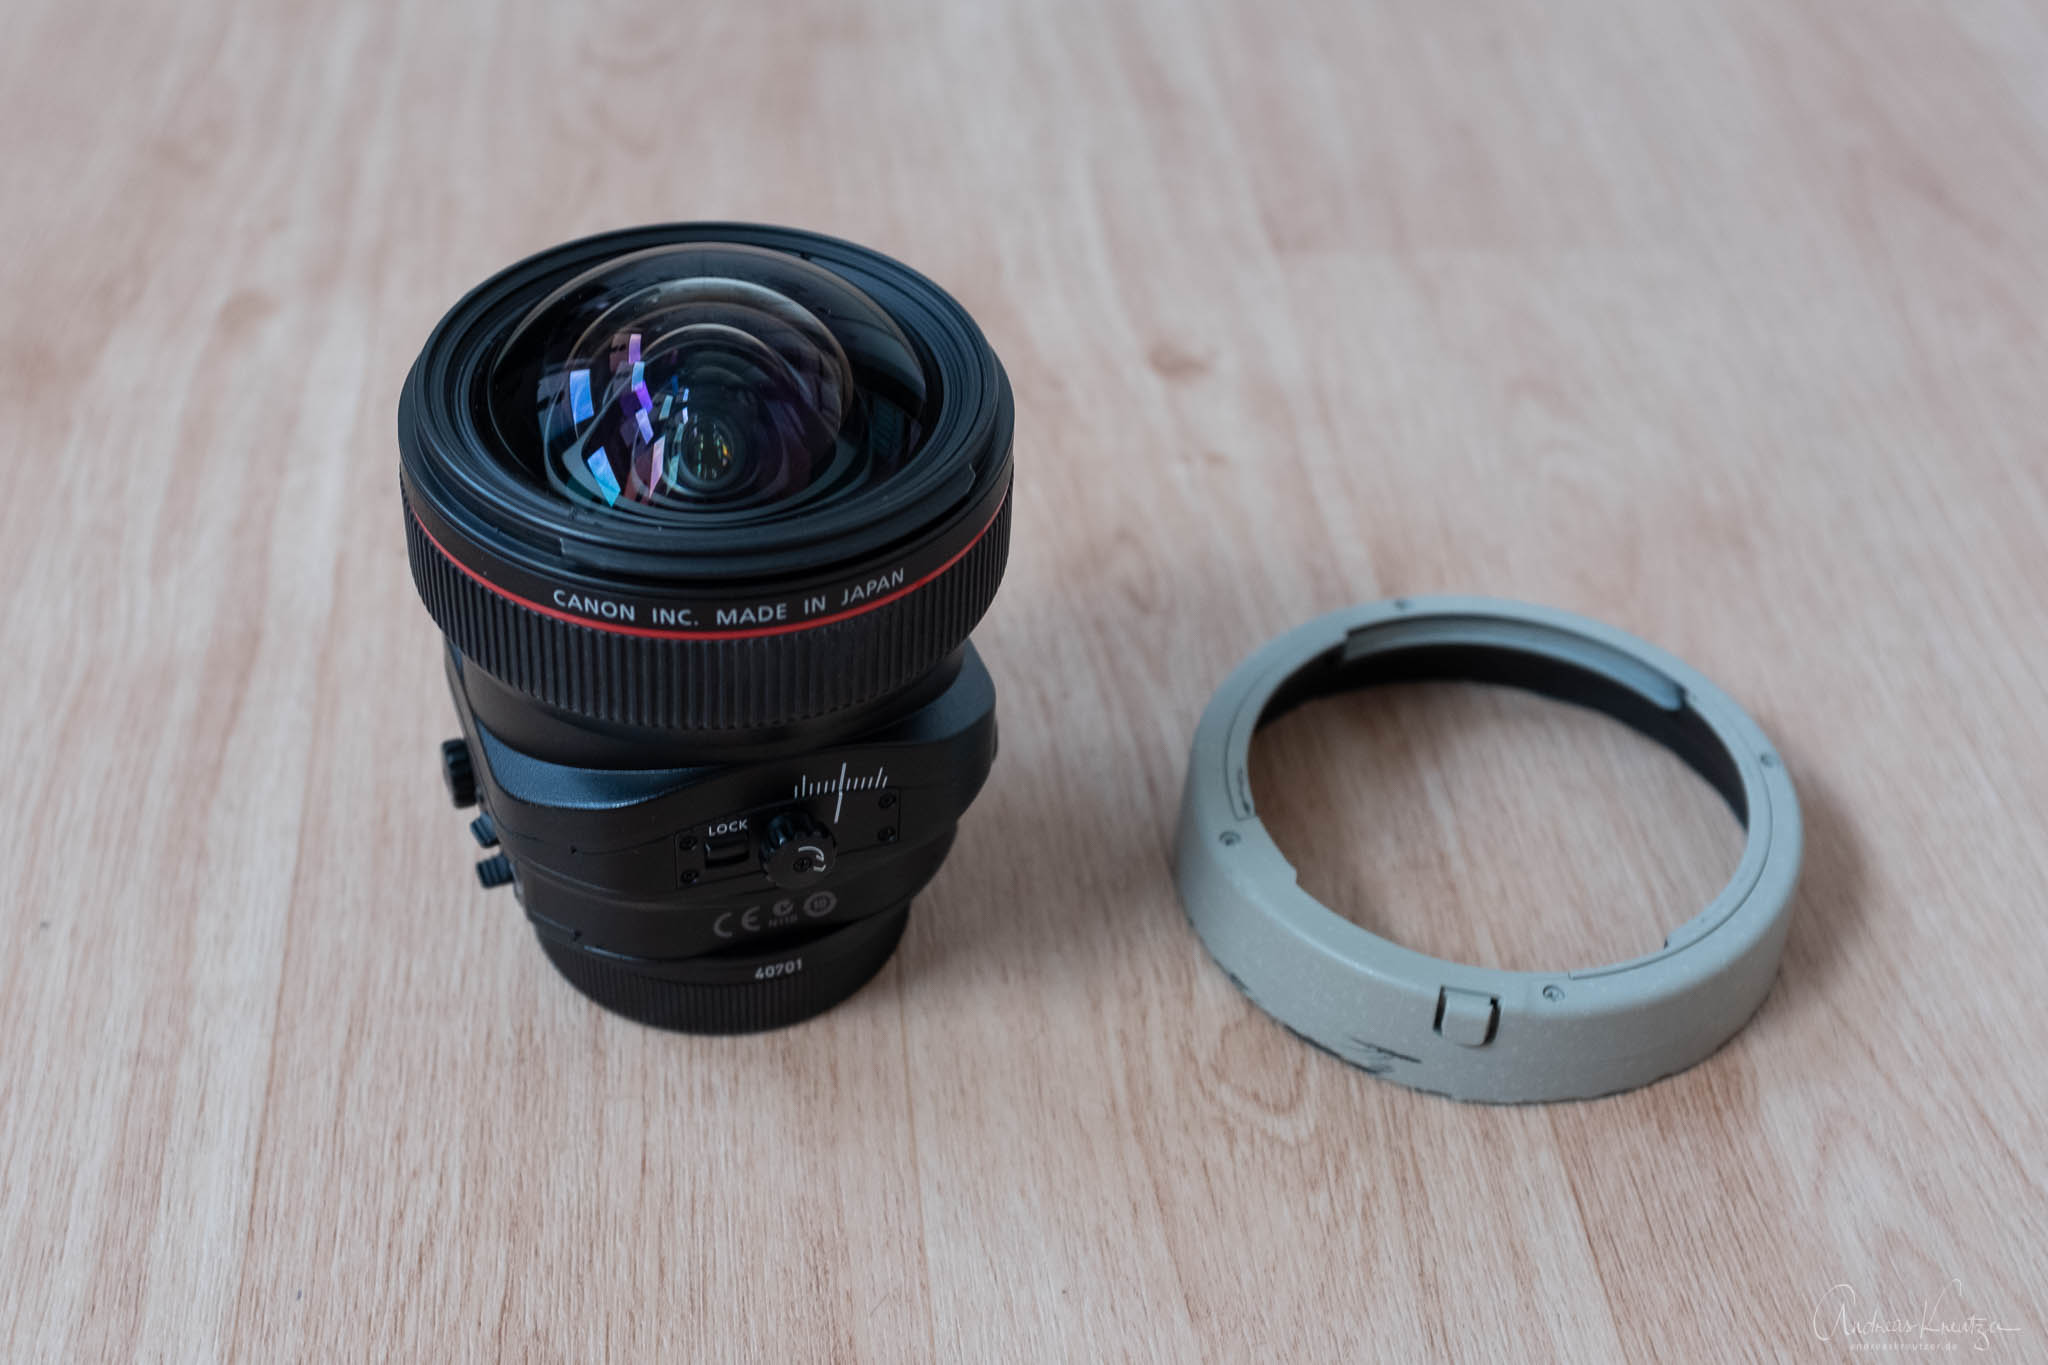 Canon TS-E 17 Gegenlichtblende